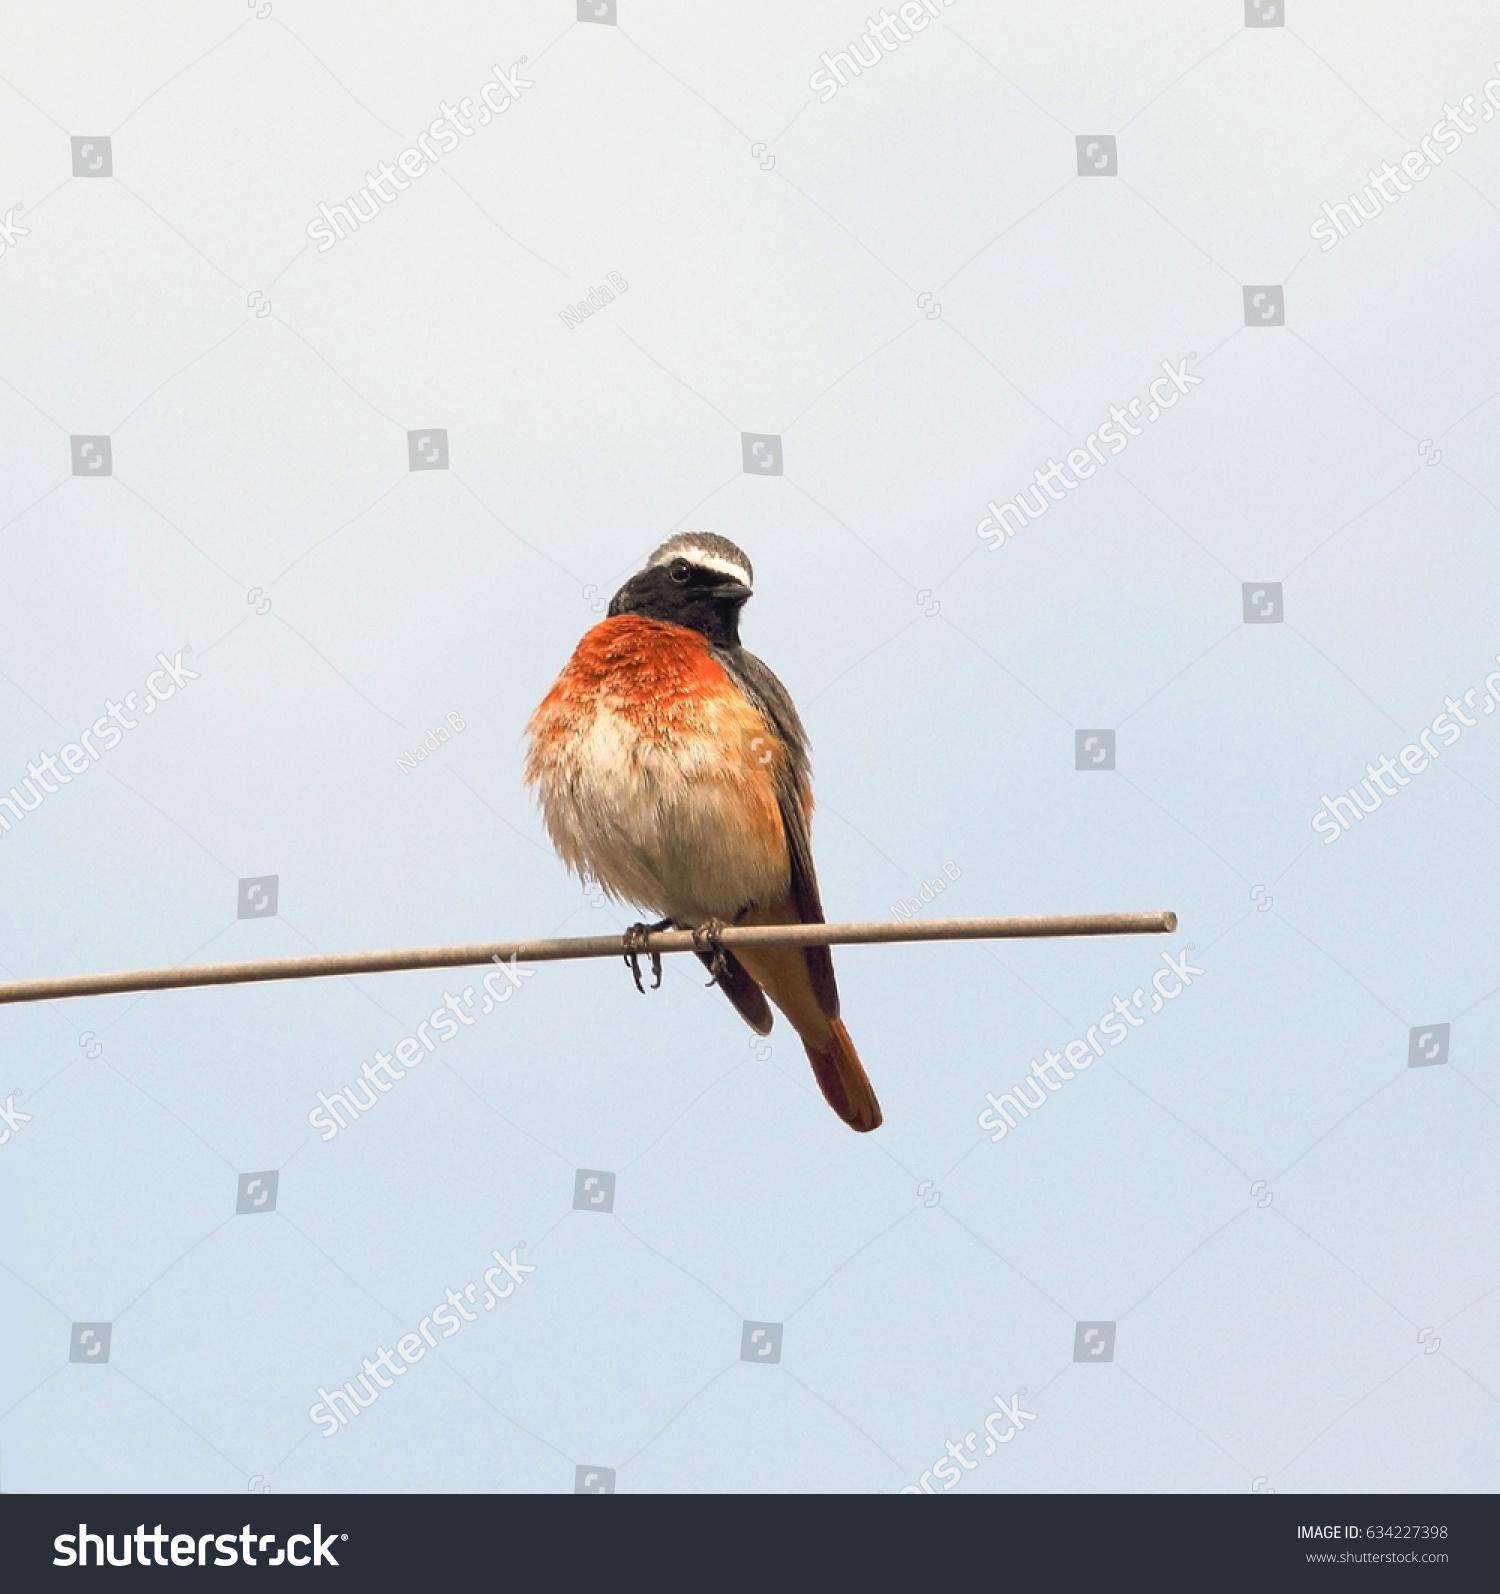 stock-photo-beautiful-nightingale-bird-b